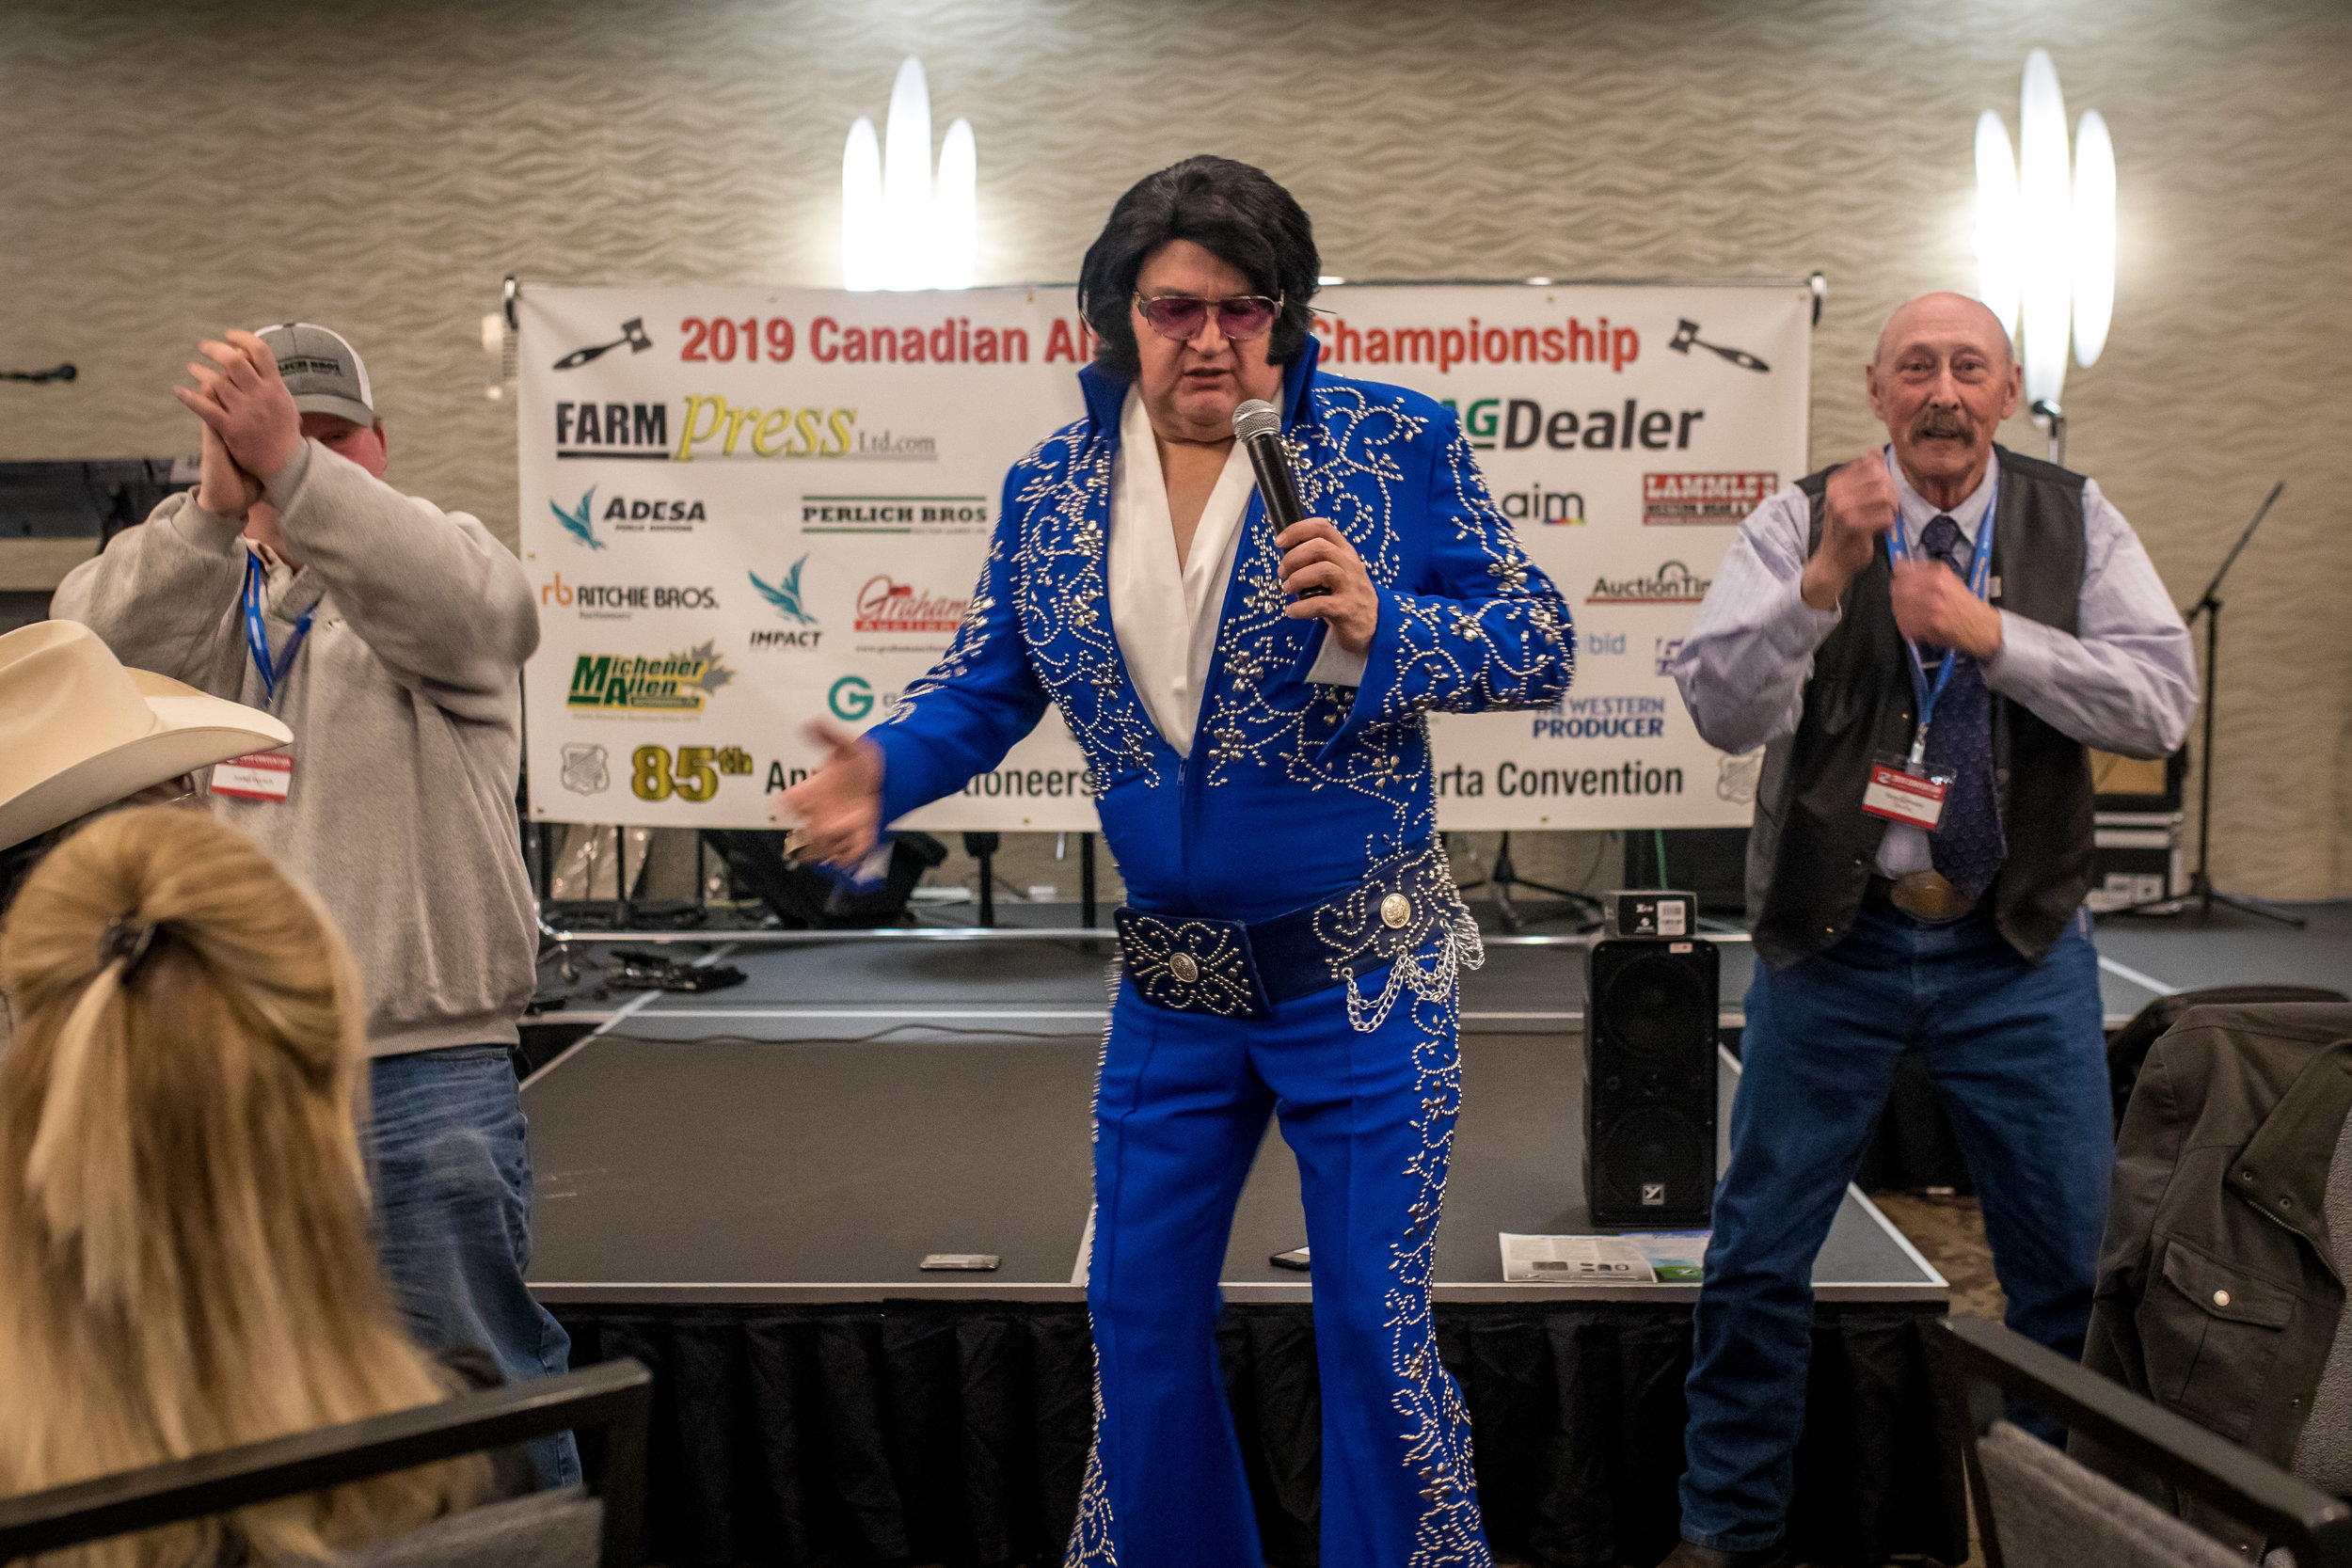 2019 02-01 Alberta Auctioneer Convention Day 02 - Calgary 28.jpg